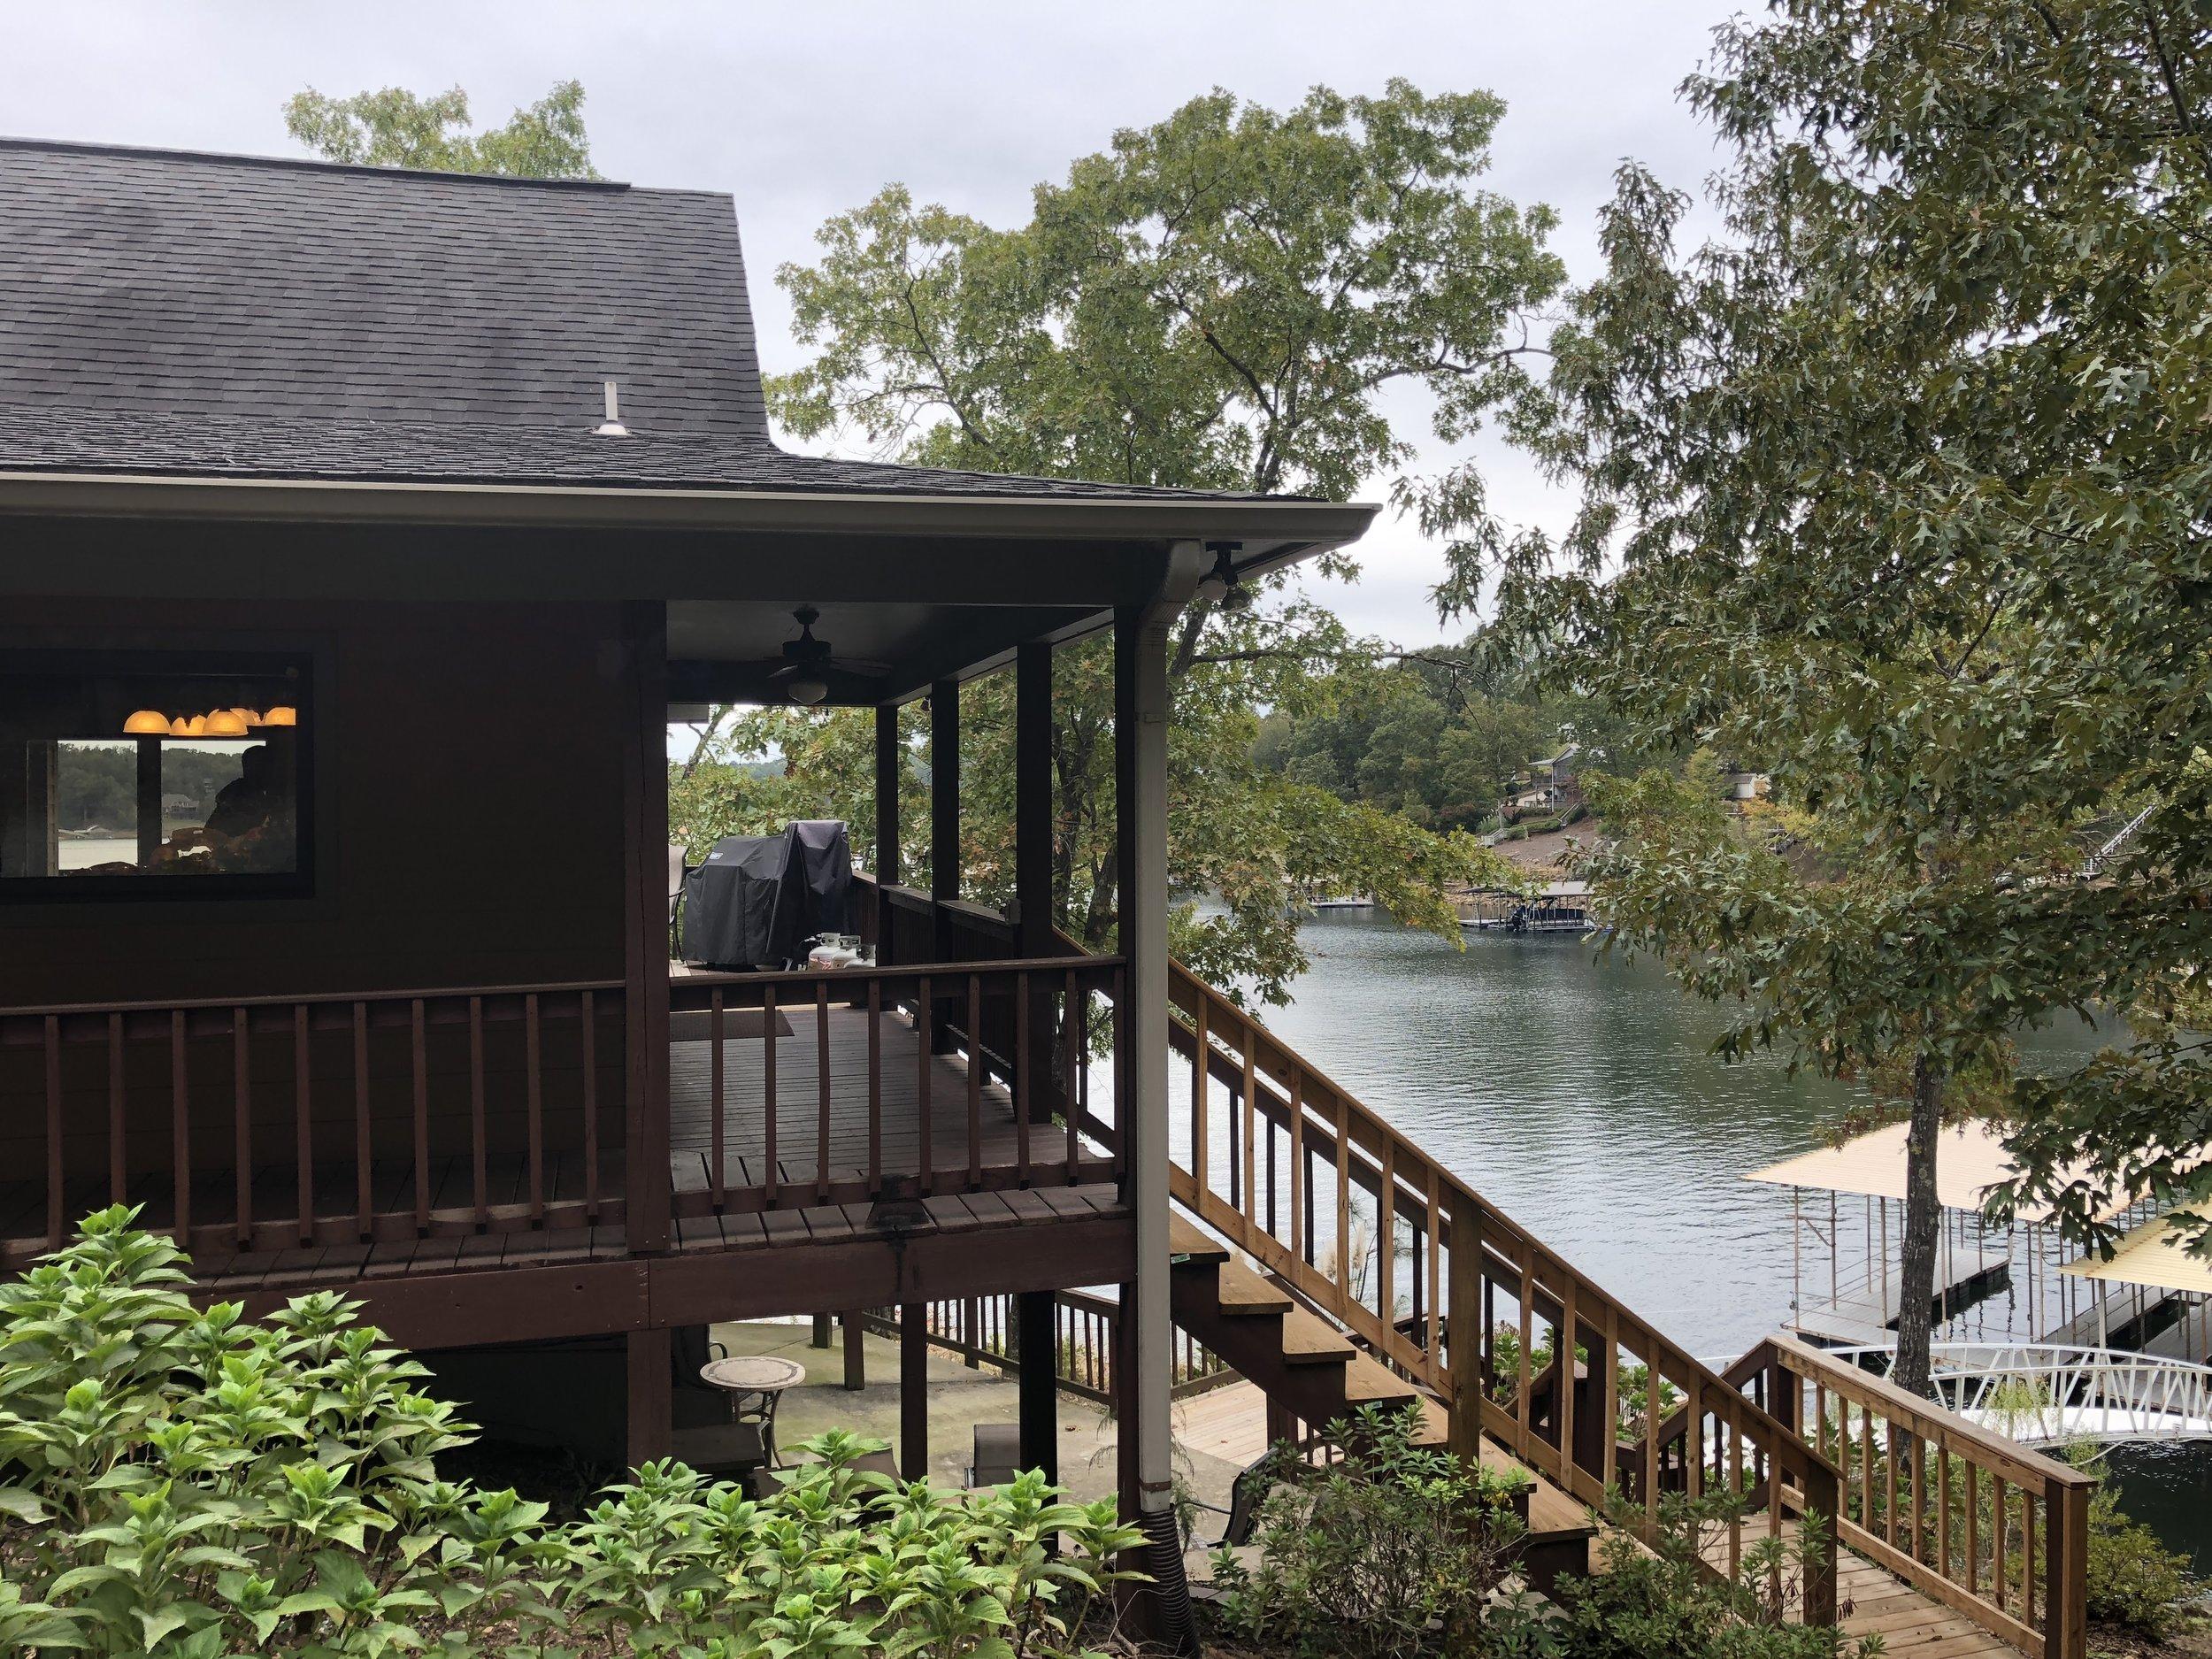 Family Paradise, Smith Lake